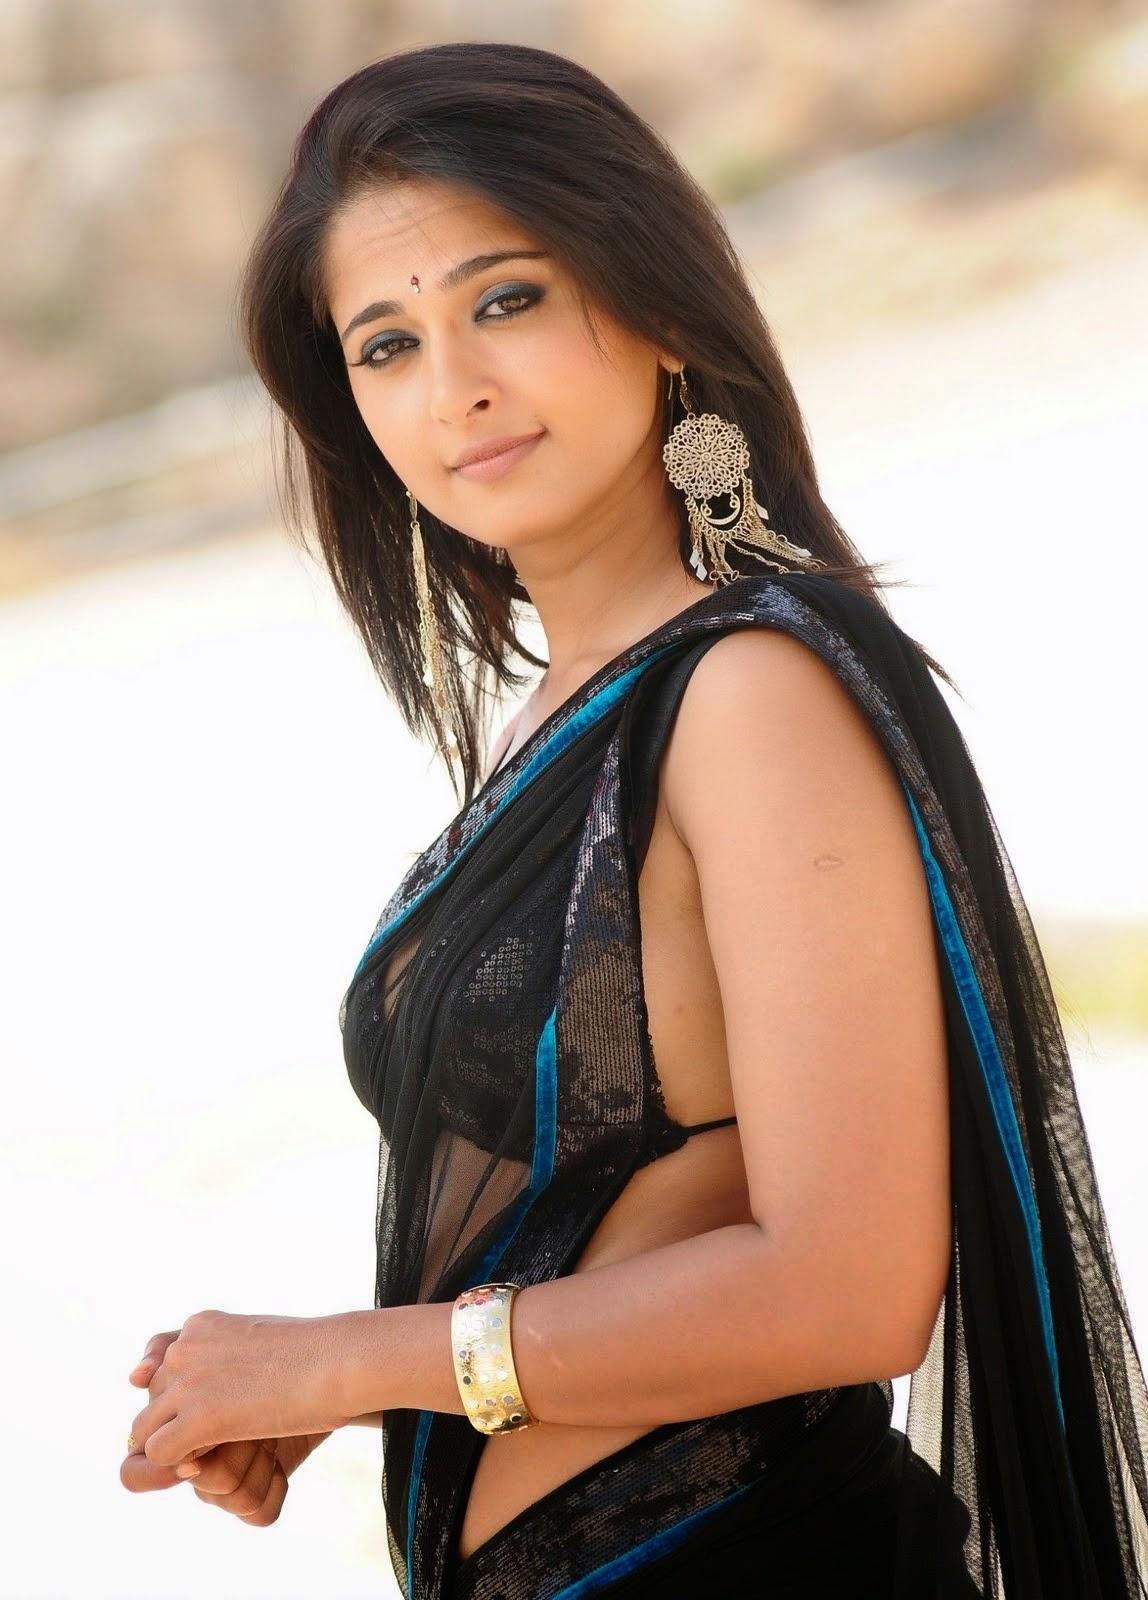 Anushka Shetty Hot Sexy Navel Show Pics In Spicy Black